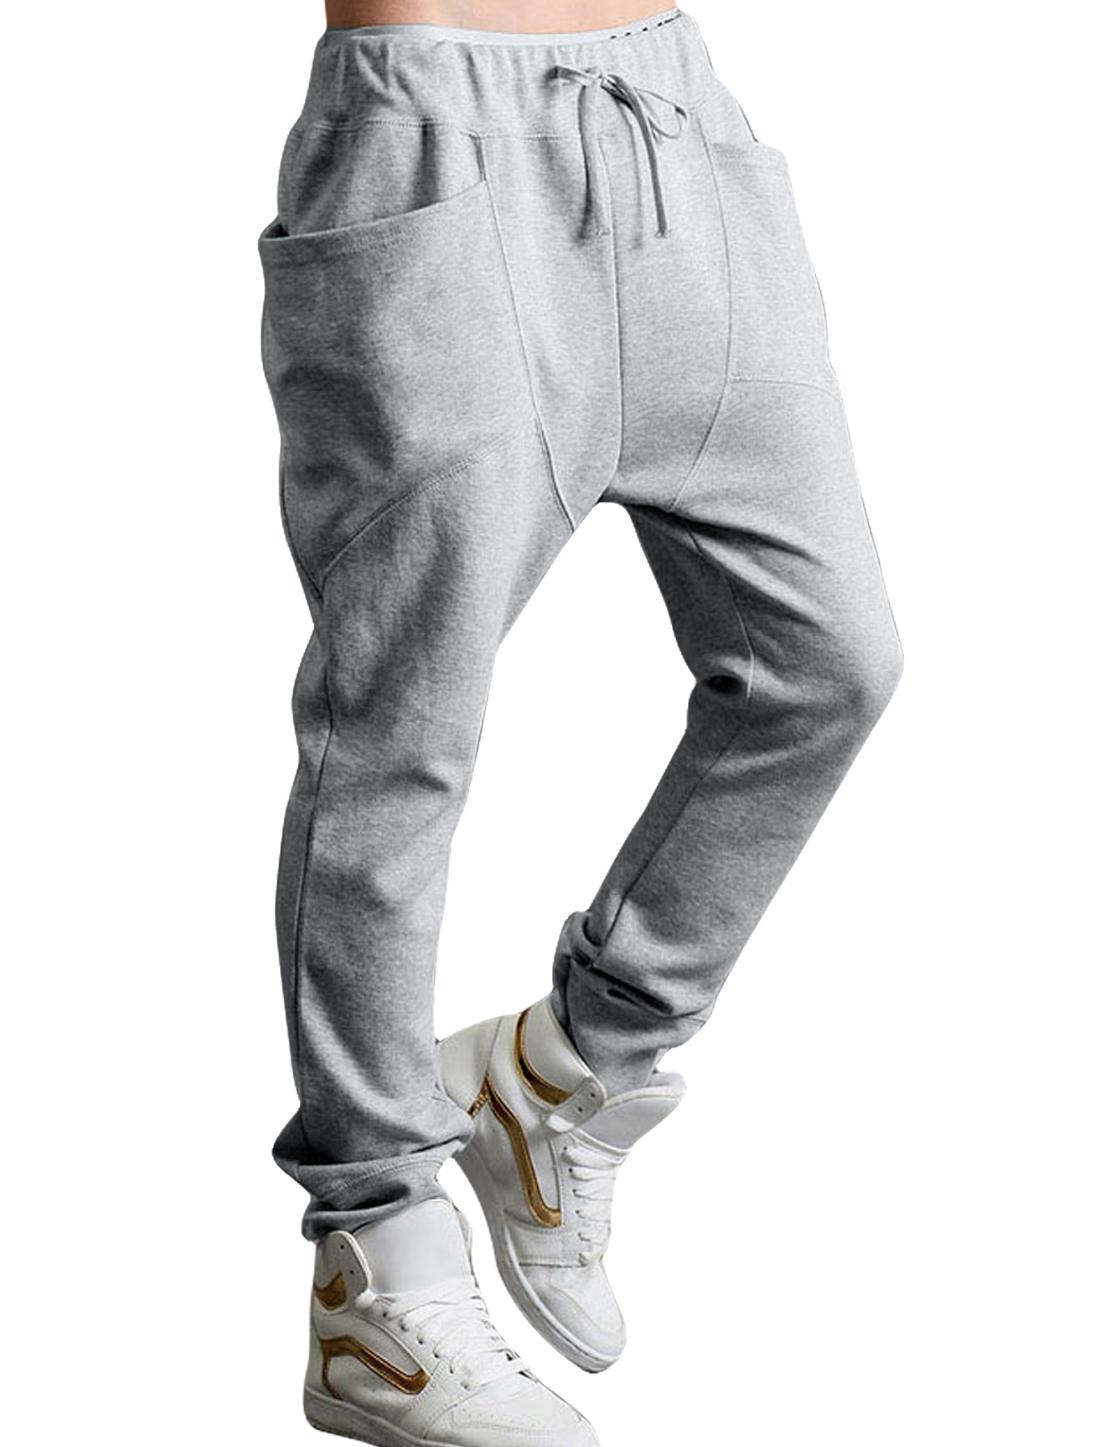 Men Two Big Pockets Deisgn Leisure Fashion Pants Light Gray W36